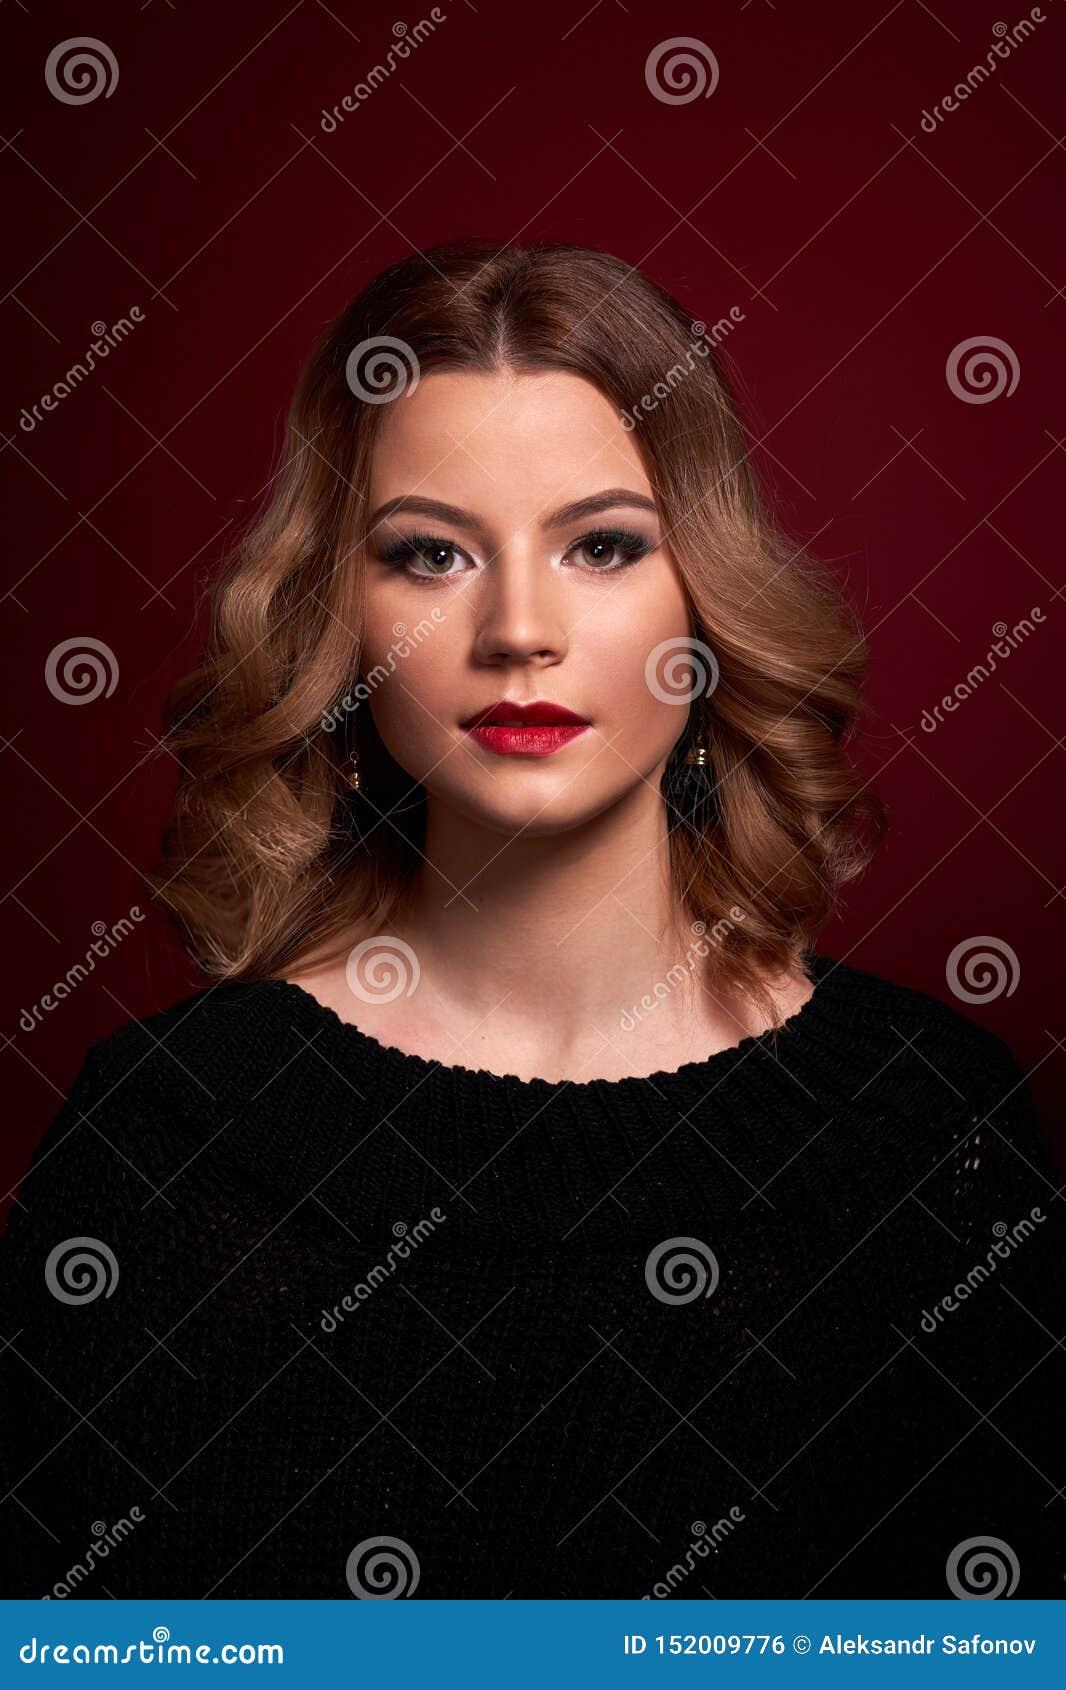 Portrait of a girl in full face